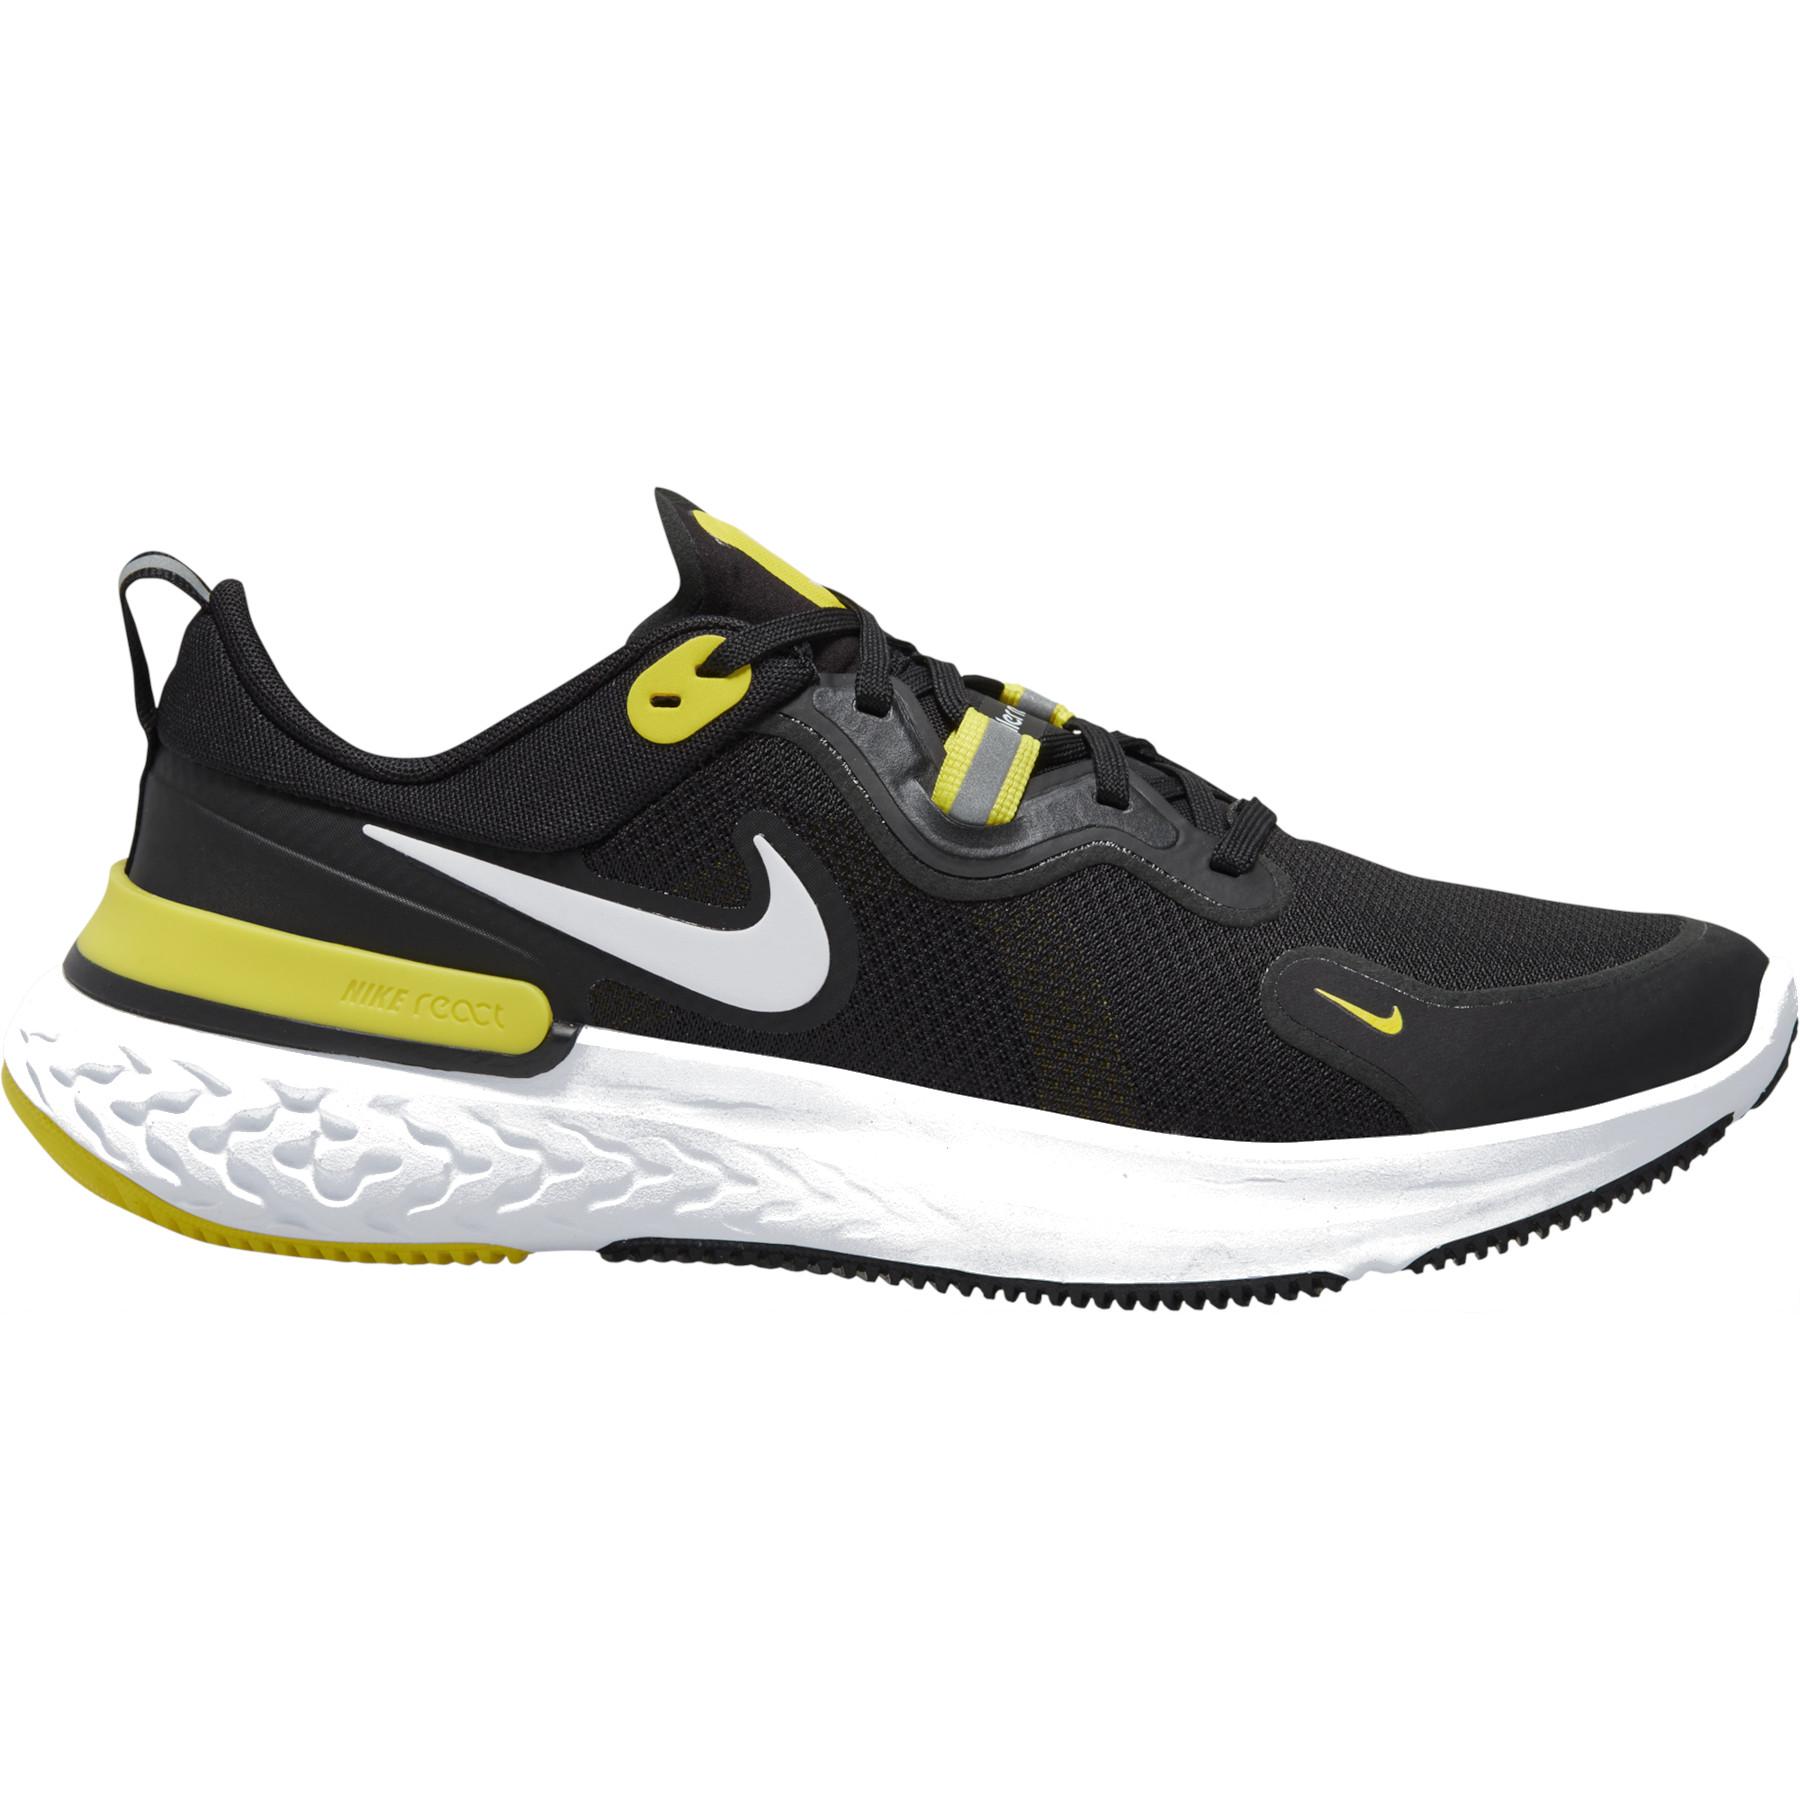 Nike React Miler Herren-Laufschuh - black/white-opti yellow-dark grey grey CW1777-009